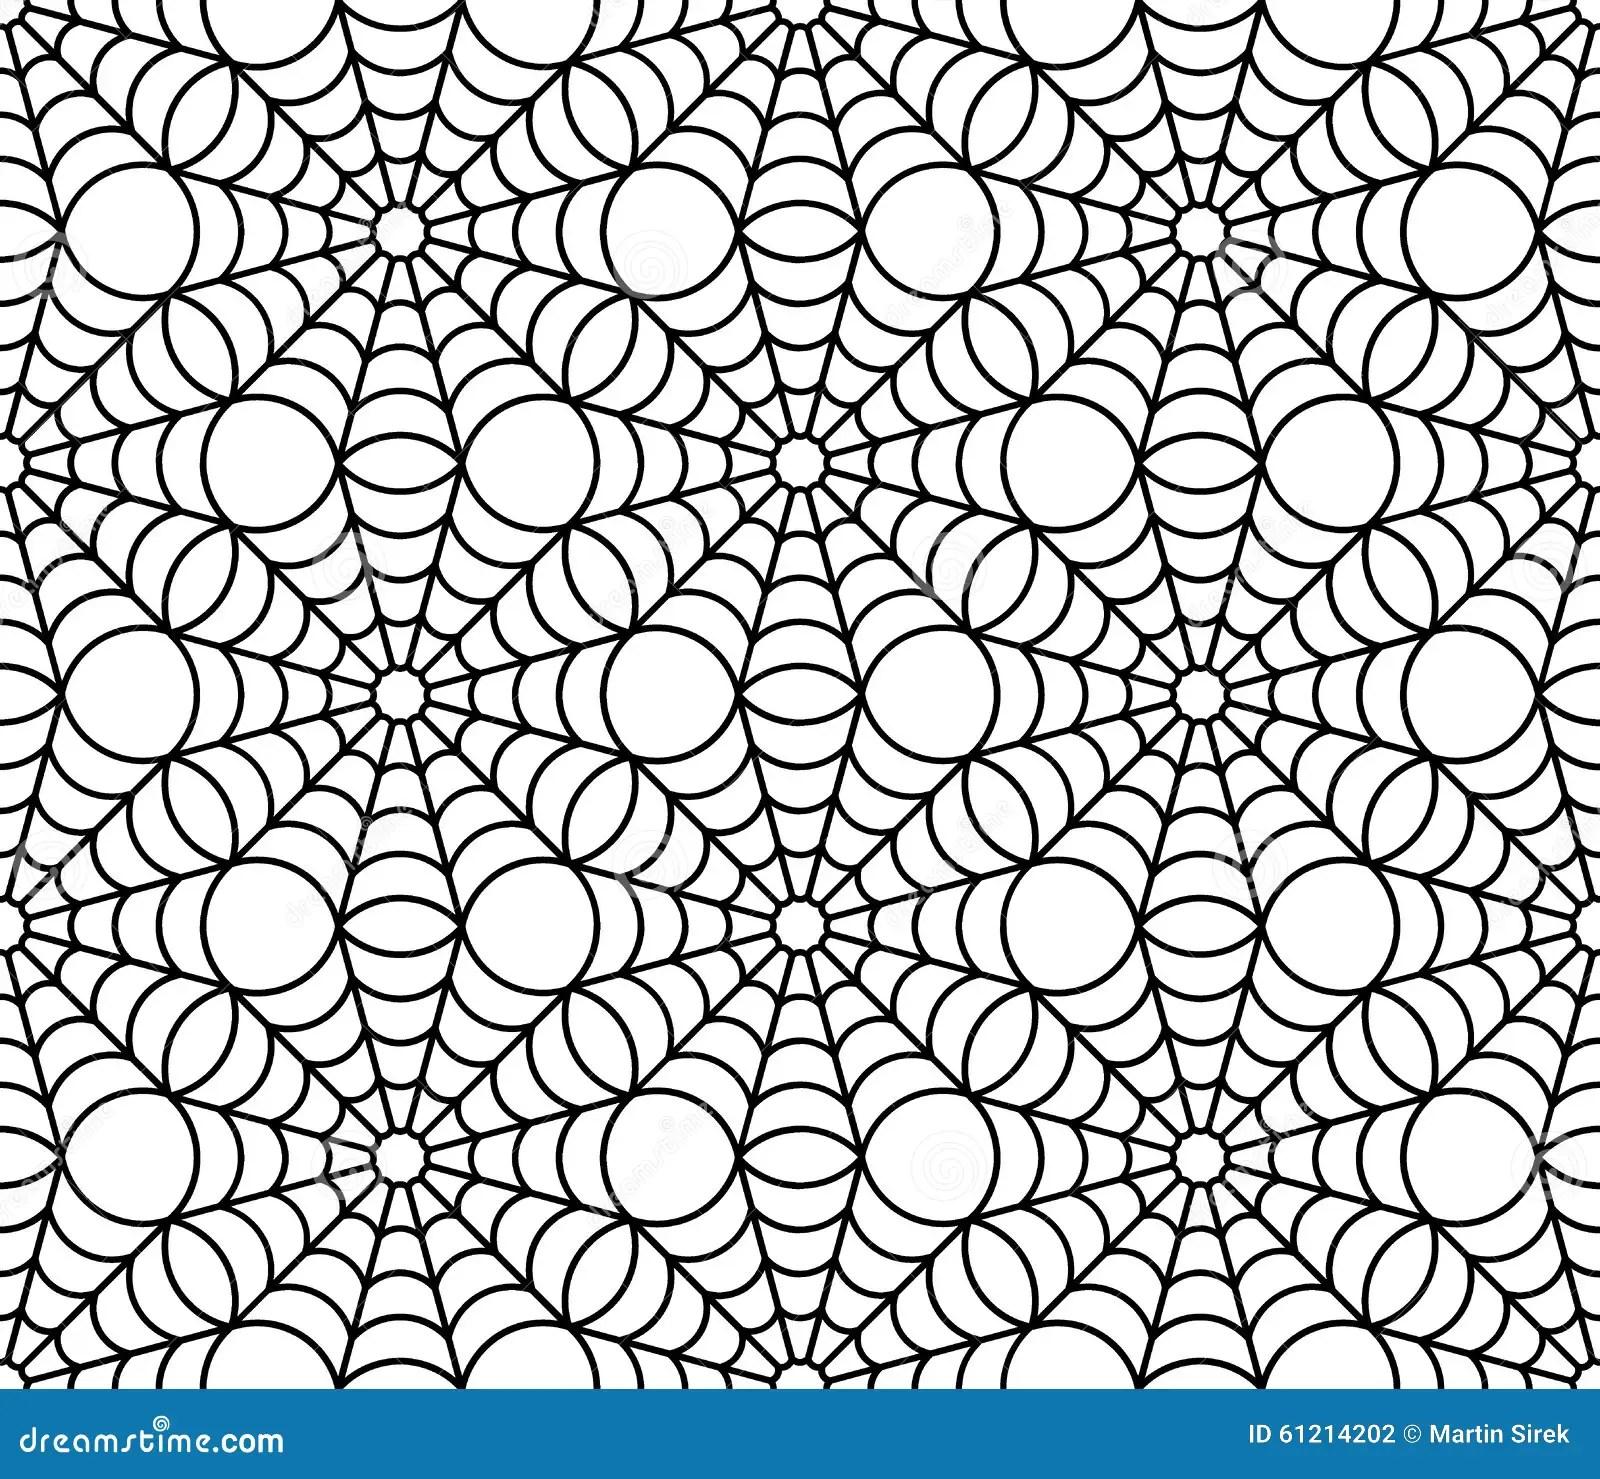 Vector Modern Seamless Geometry Pattern Spider Web